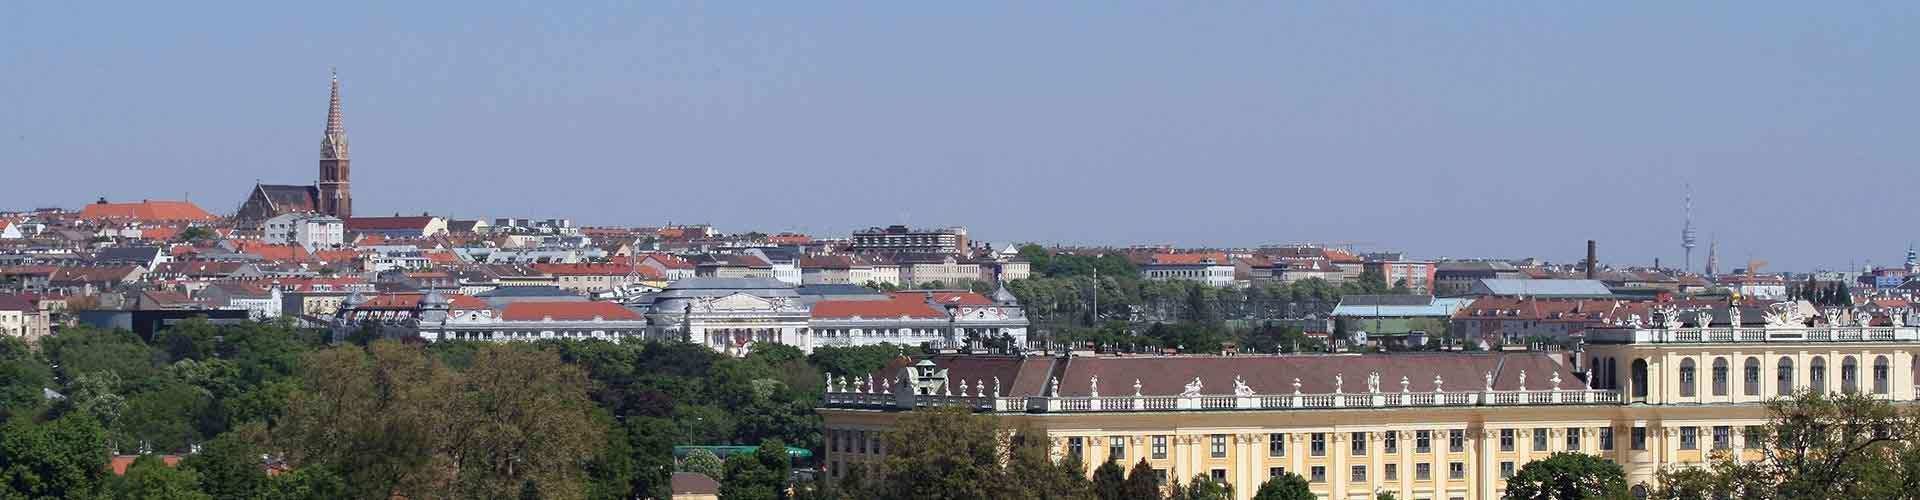 Wien – Hostellit kaupungiosassa Rudolfsheim-Fuenfhaus. Wien -karttoja, valokuvia ja arvosteluja kaikista Wien -hostelleista.